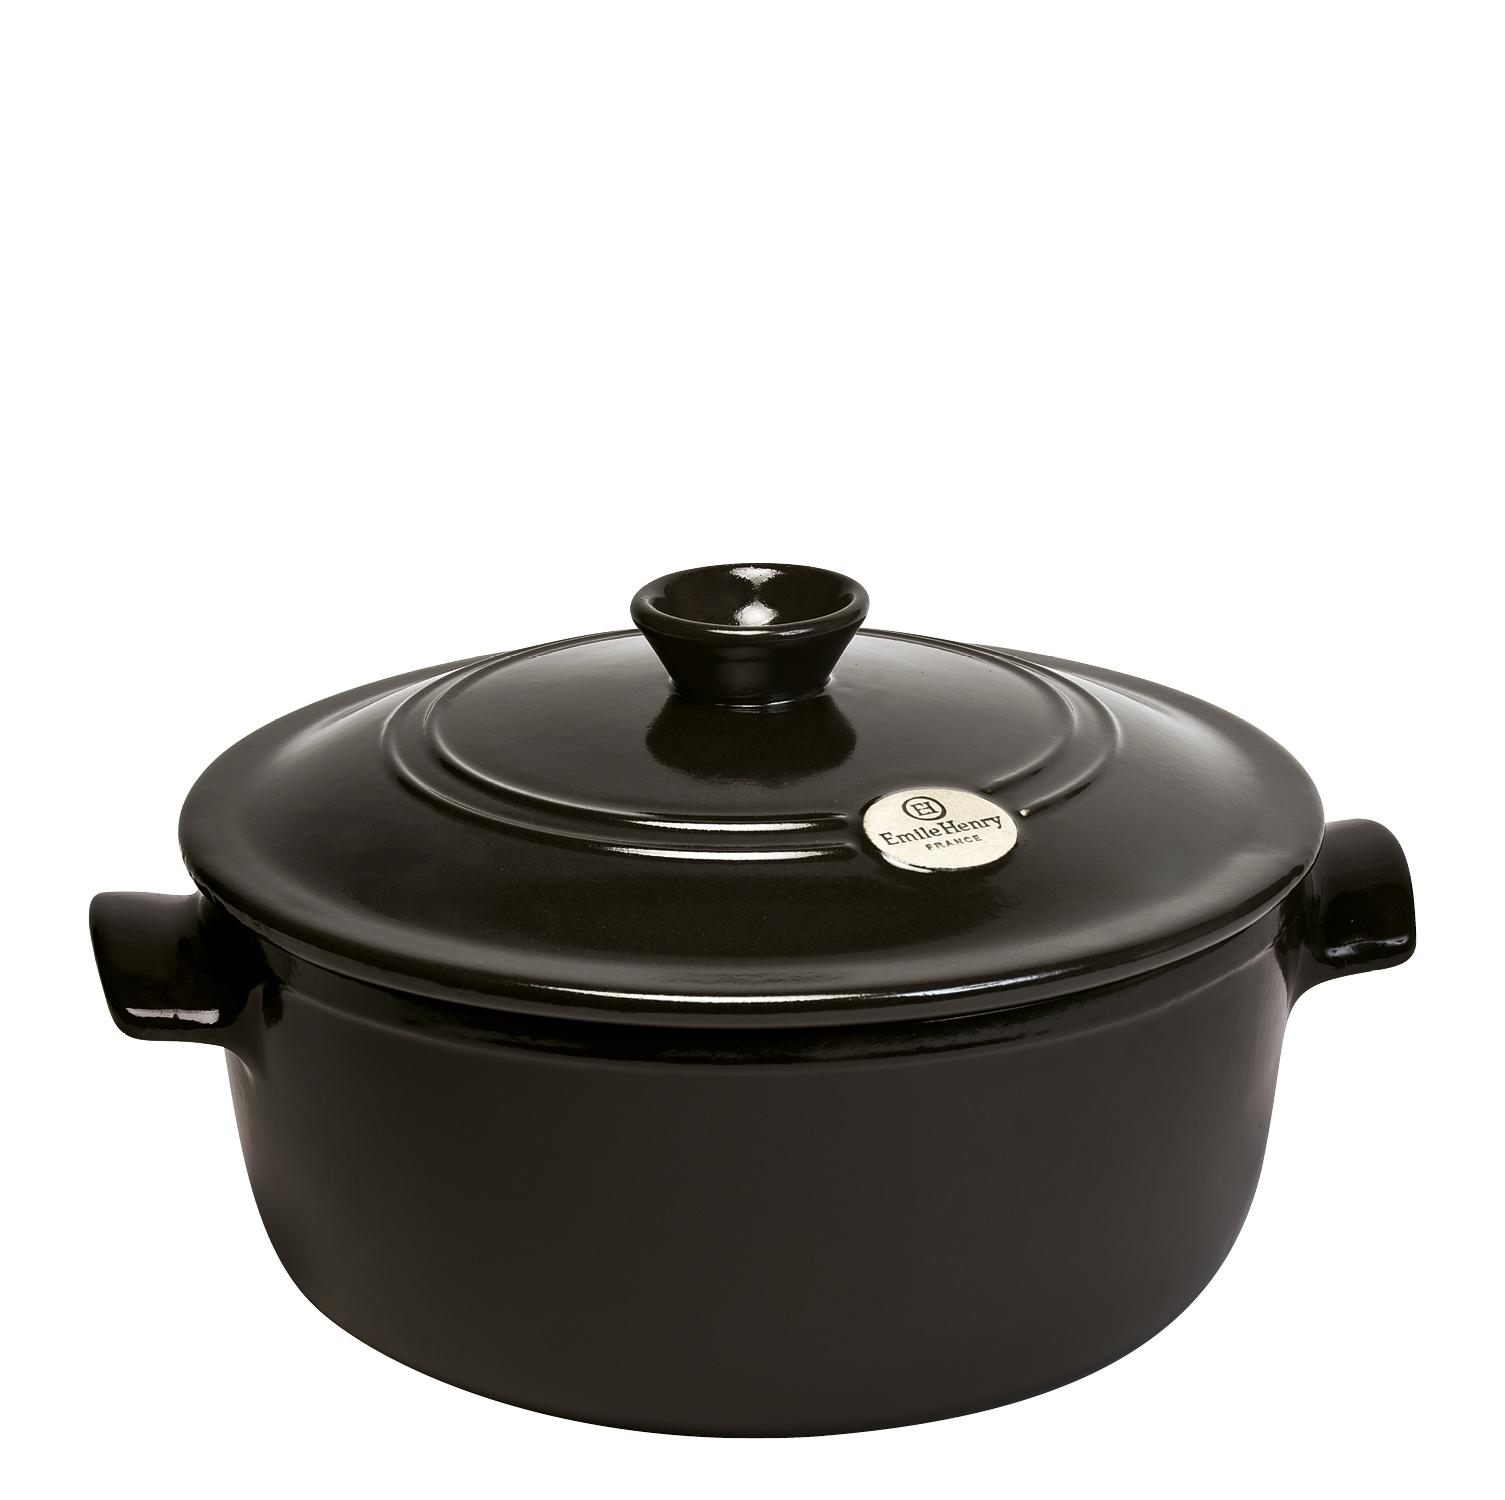 Онлайн каталог PROMENU: Кастрюля с крышкой Emile Henry Cookware, объем 4 л, диаметр 26 см, черный Emile Henry 794540